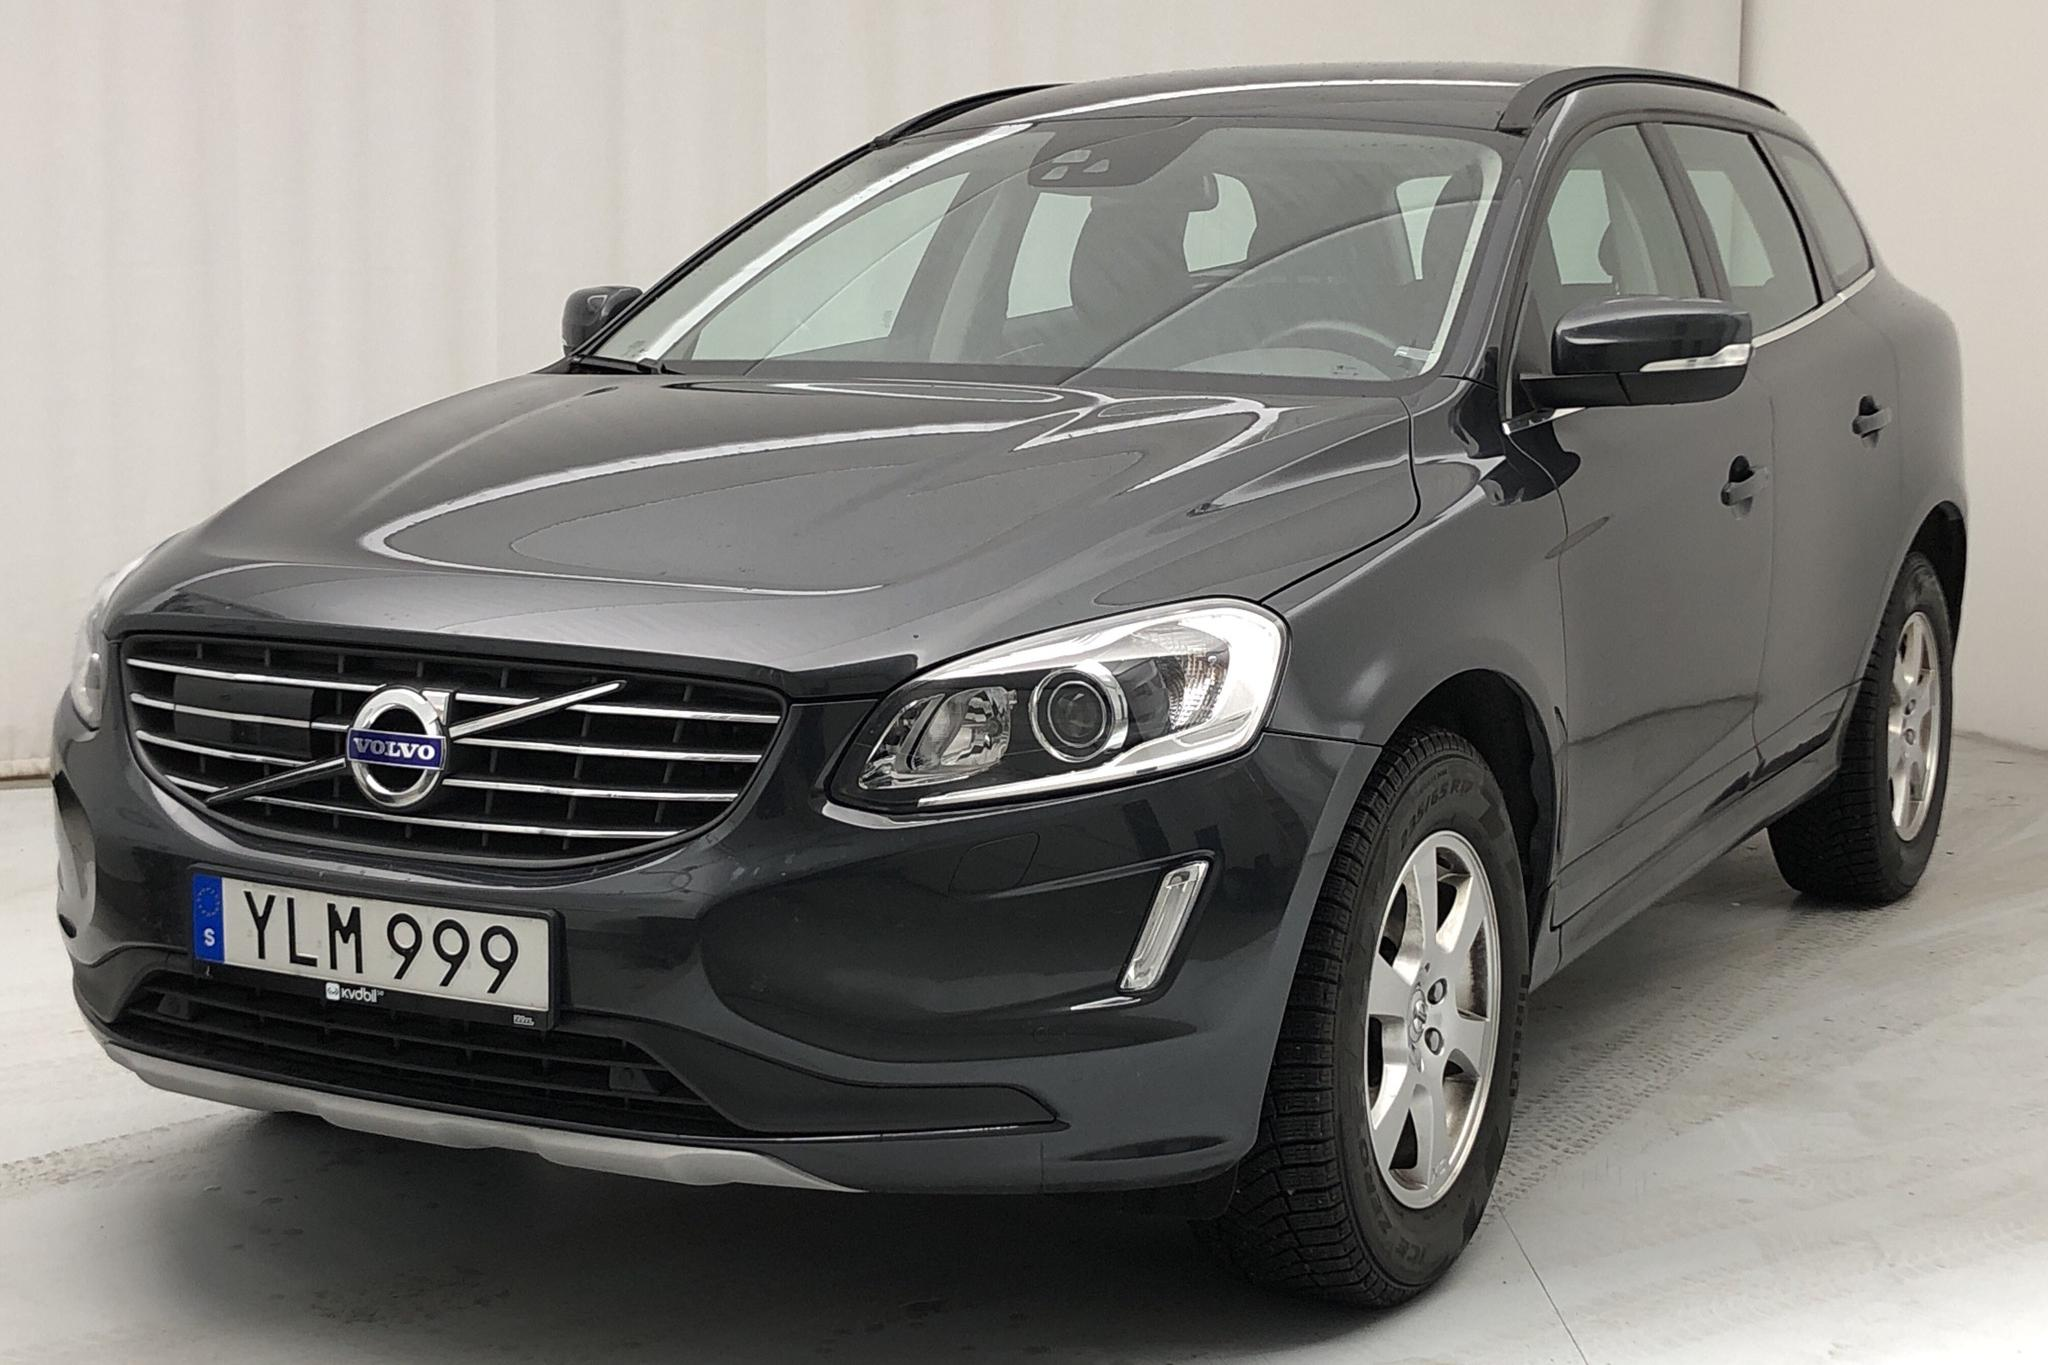 Volvo XC60 D4 AWD (190hk) - 54 520 km - Automatic - gray - 2017